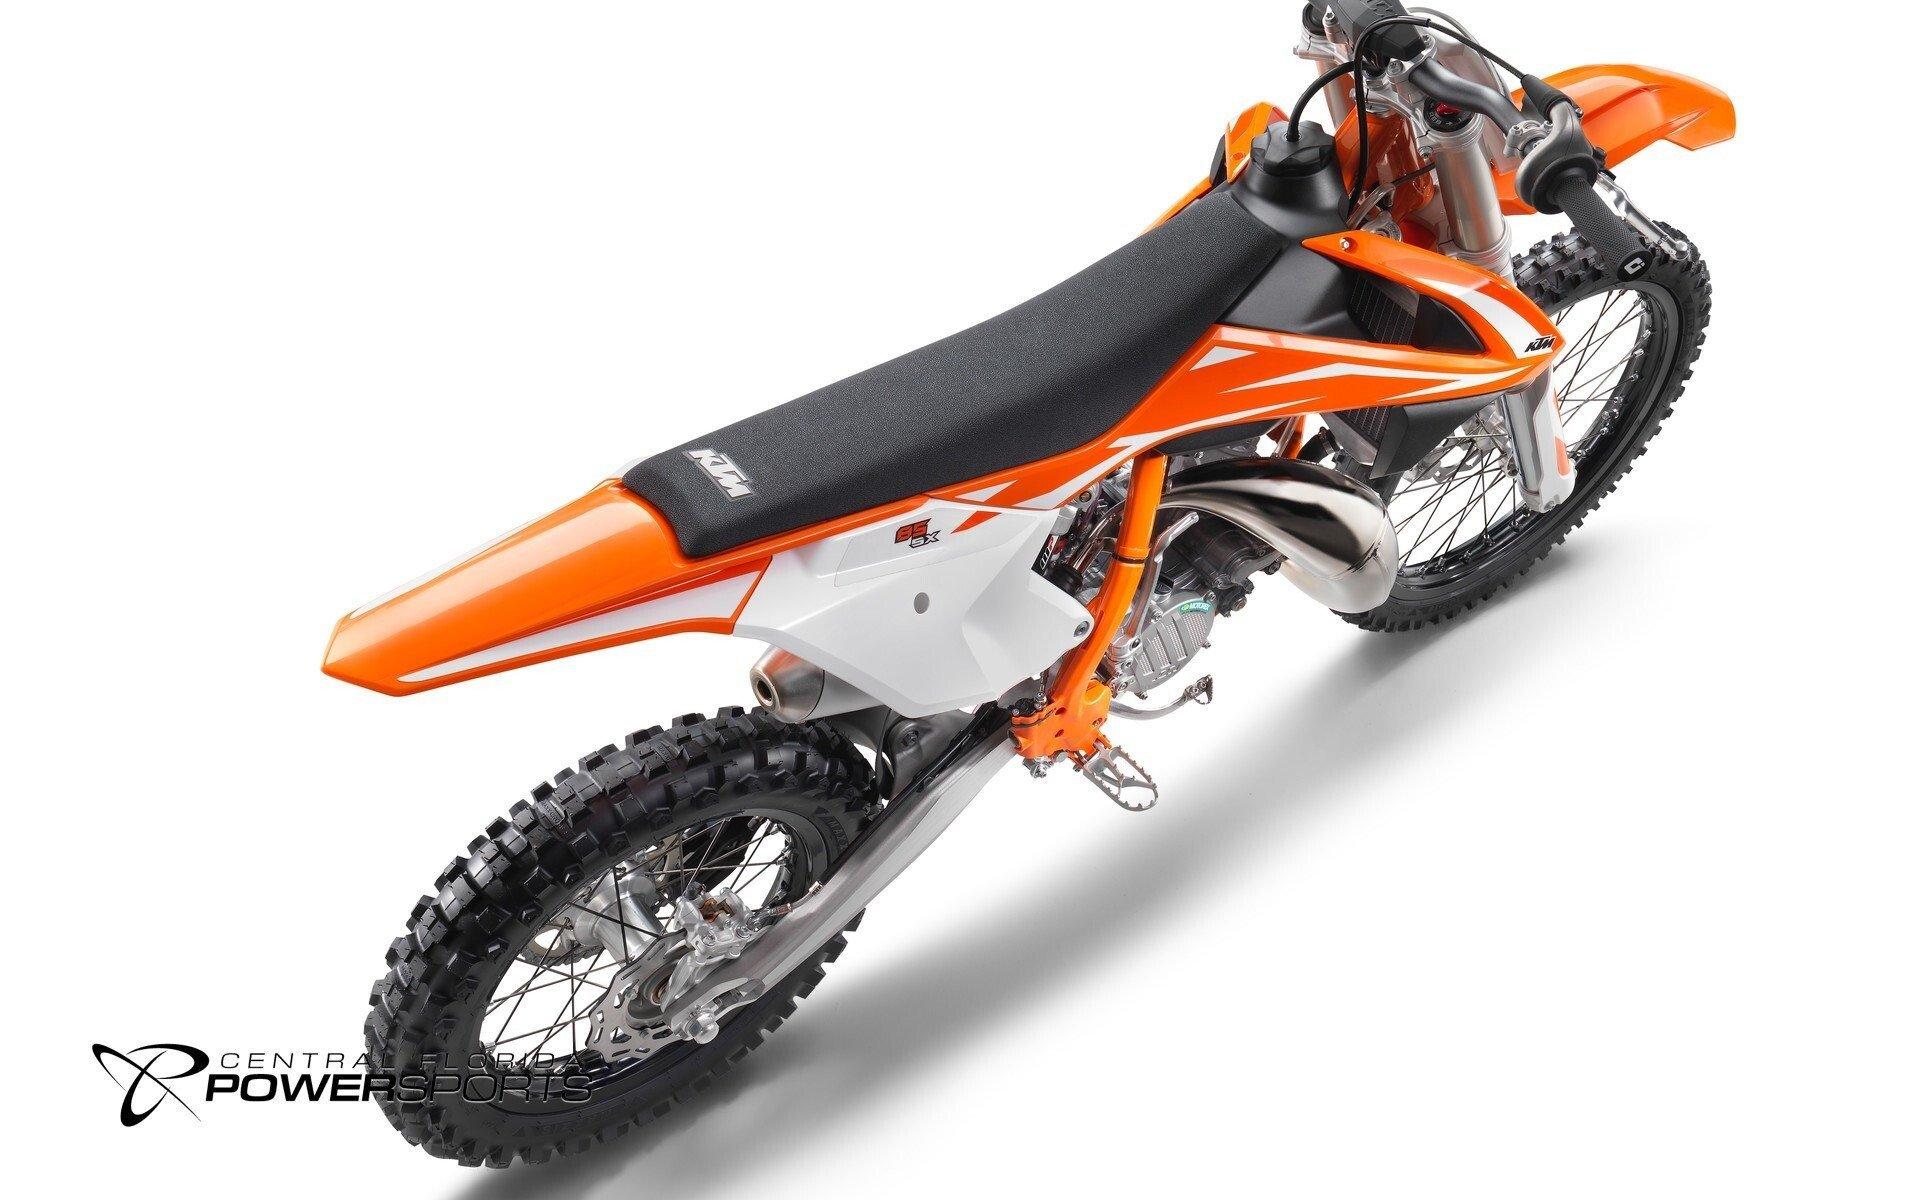 2018 ktm 85 price.  2018 2018 ktm 85sx for sale 200464441 to ktm 85 price e